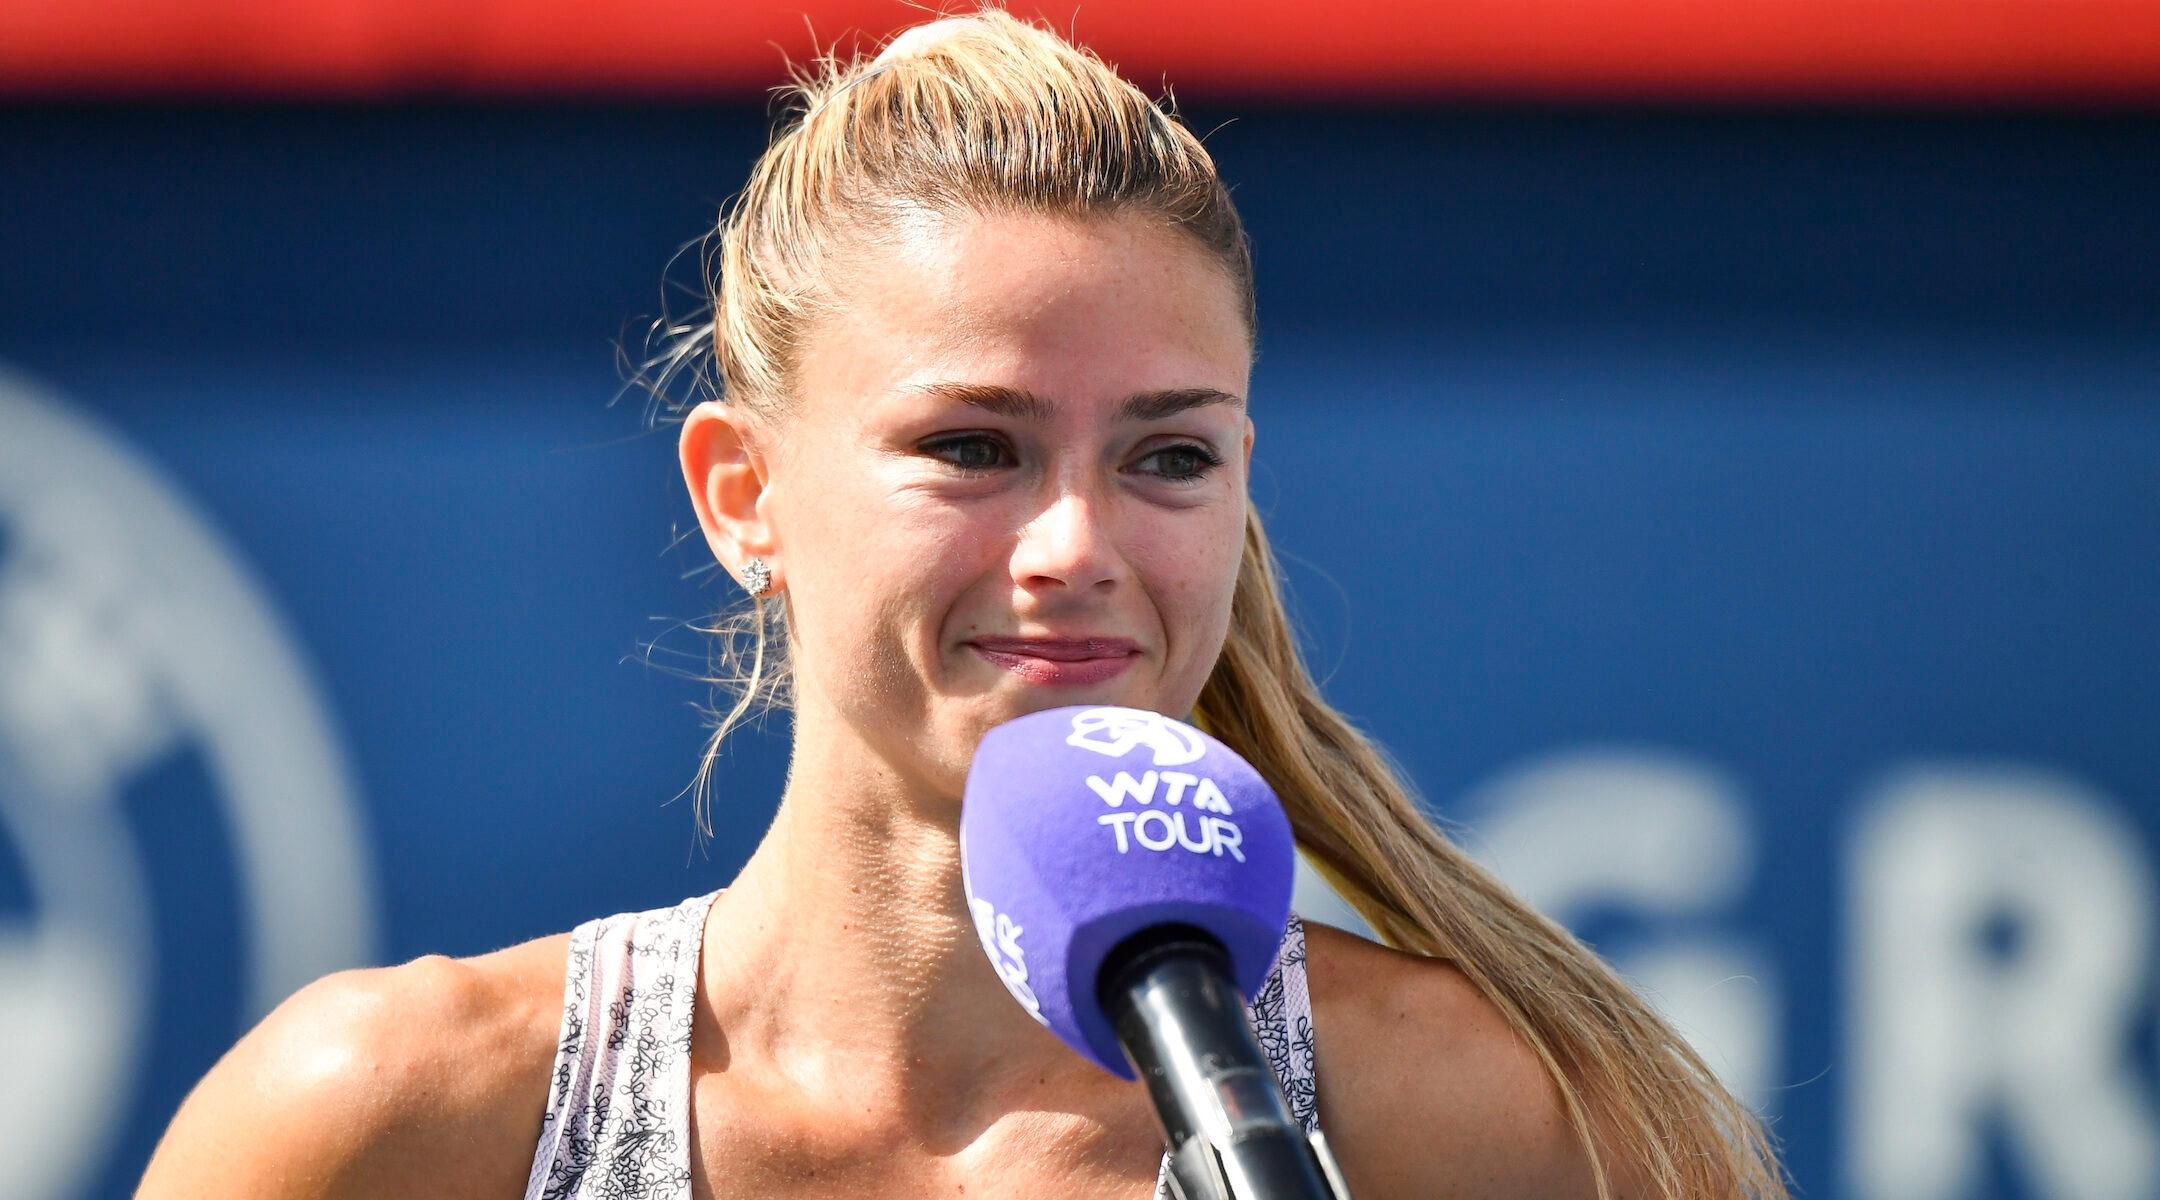 Camila Giorgi addresses spectators after winningthe National Bank Open